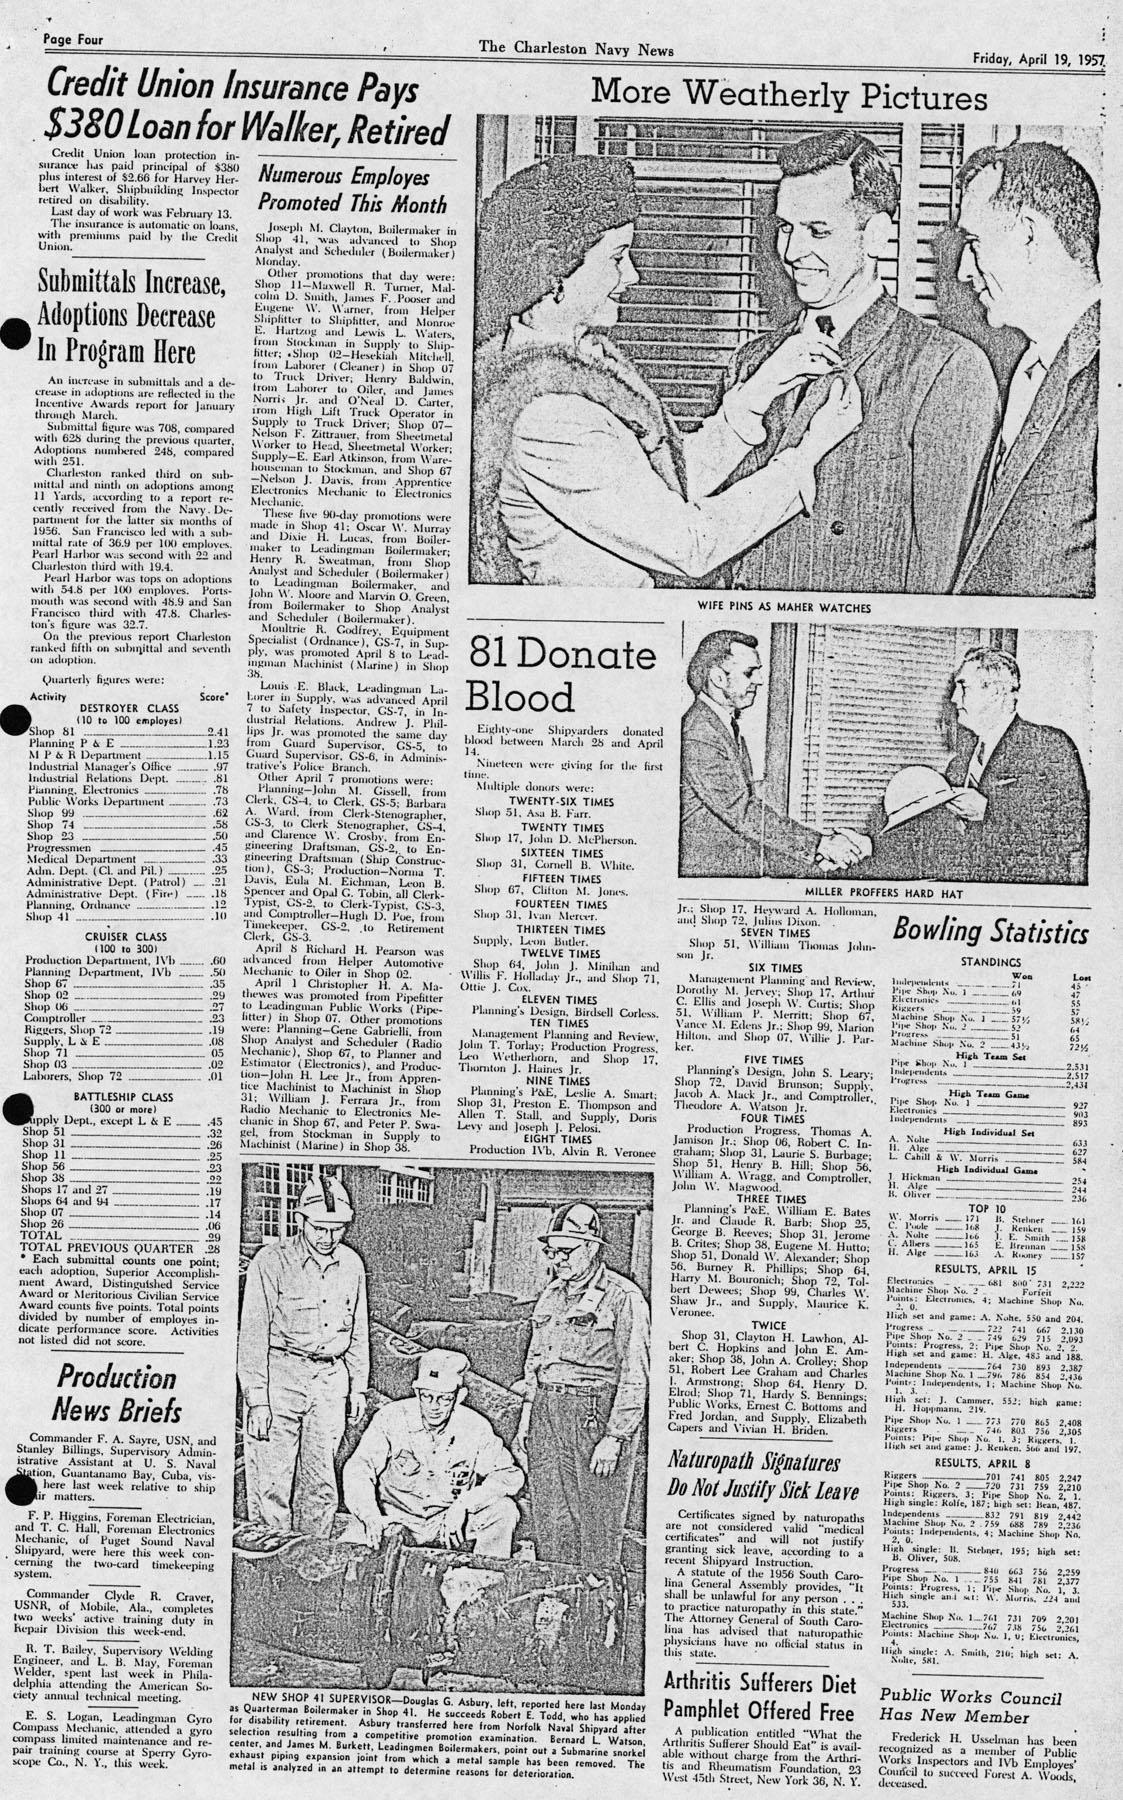 The Charleston Navy News, Volume 15, Edition 20, page iv